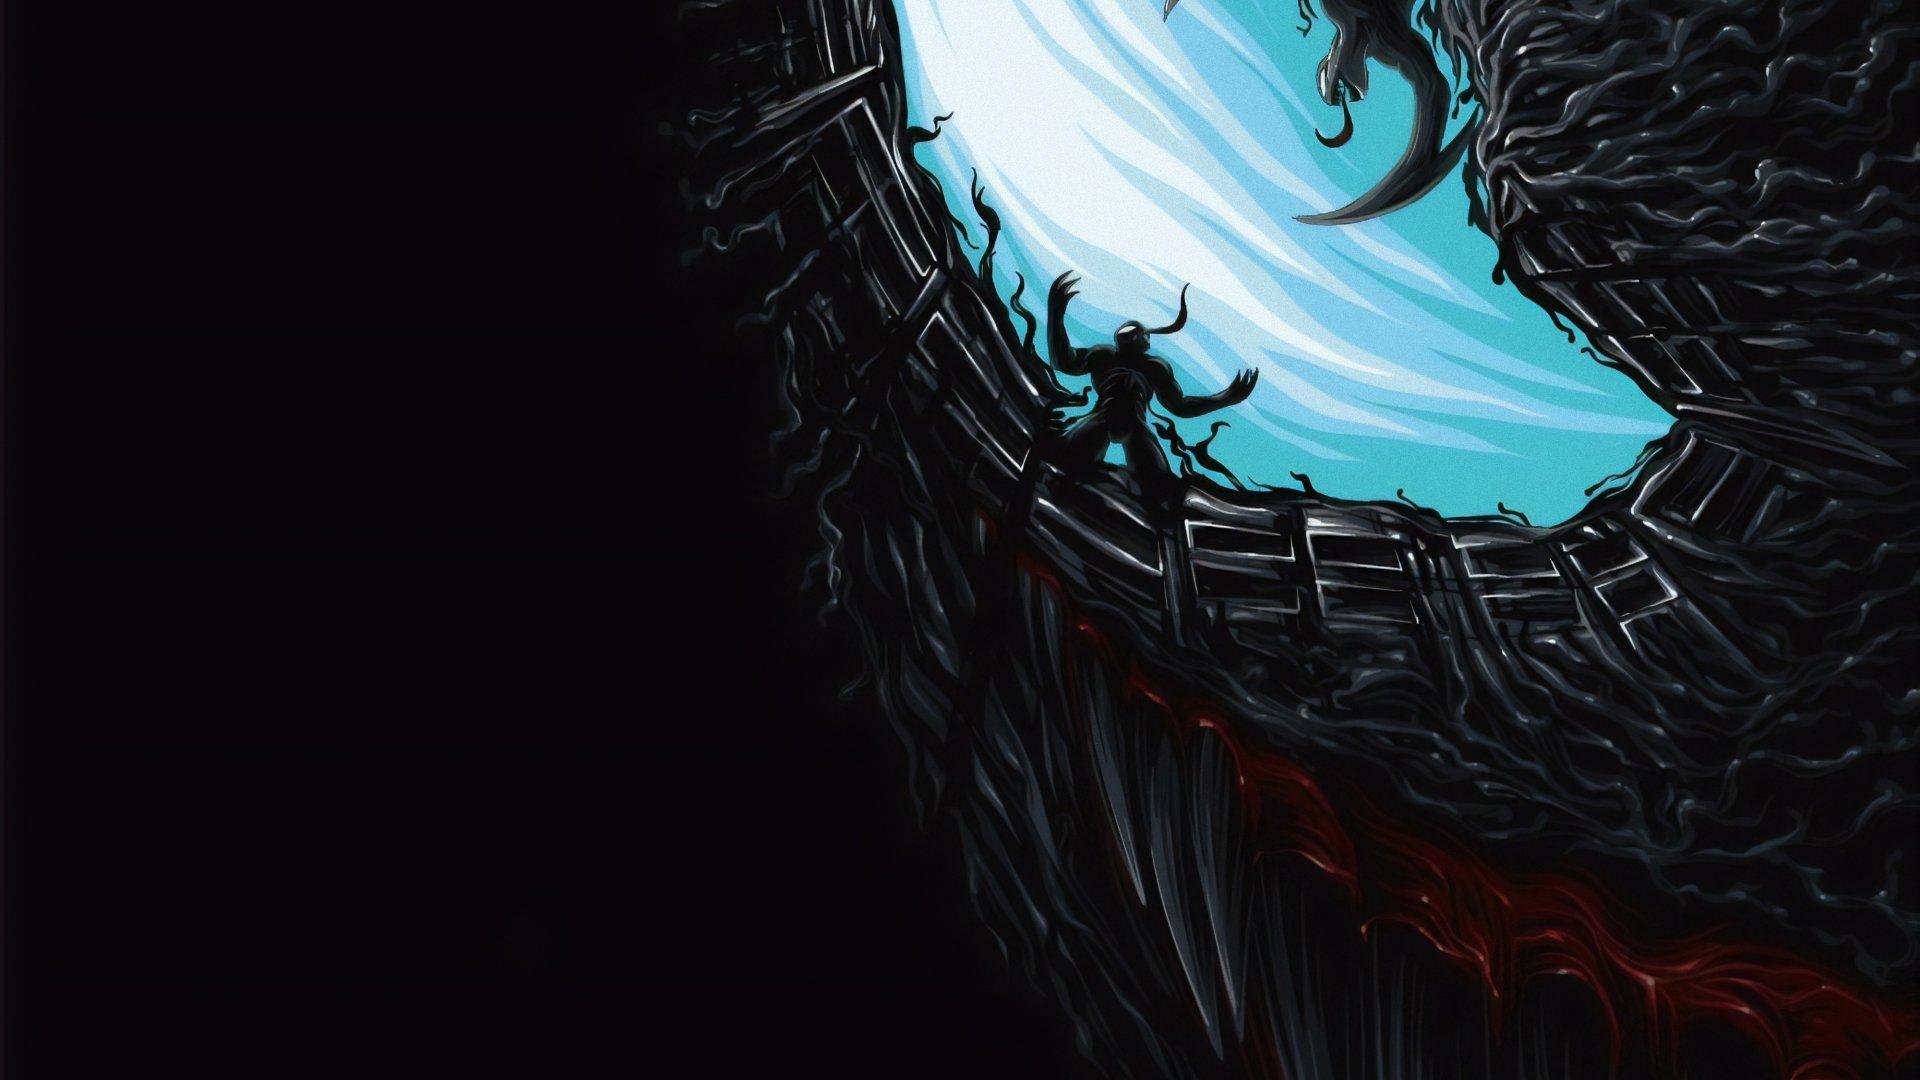 Venom 4k ultra hd wallpaper background image 4000x2250 id 976775 wallpaper abyss - Background images 4k hd ...